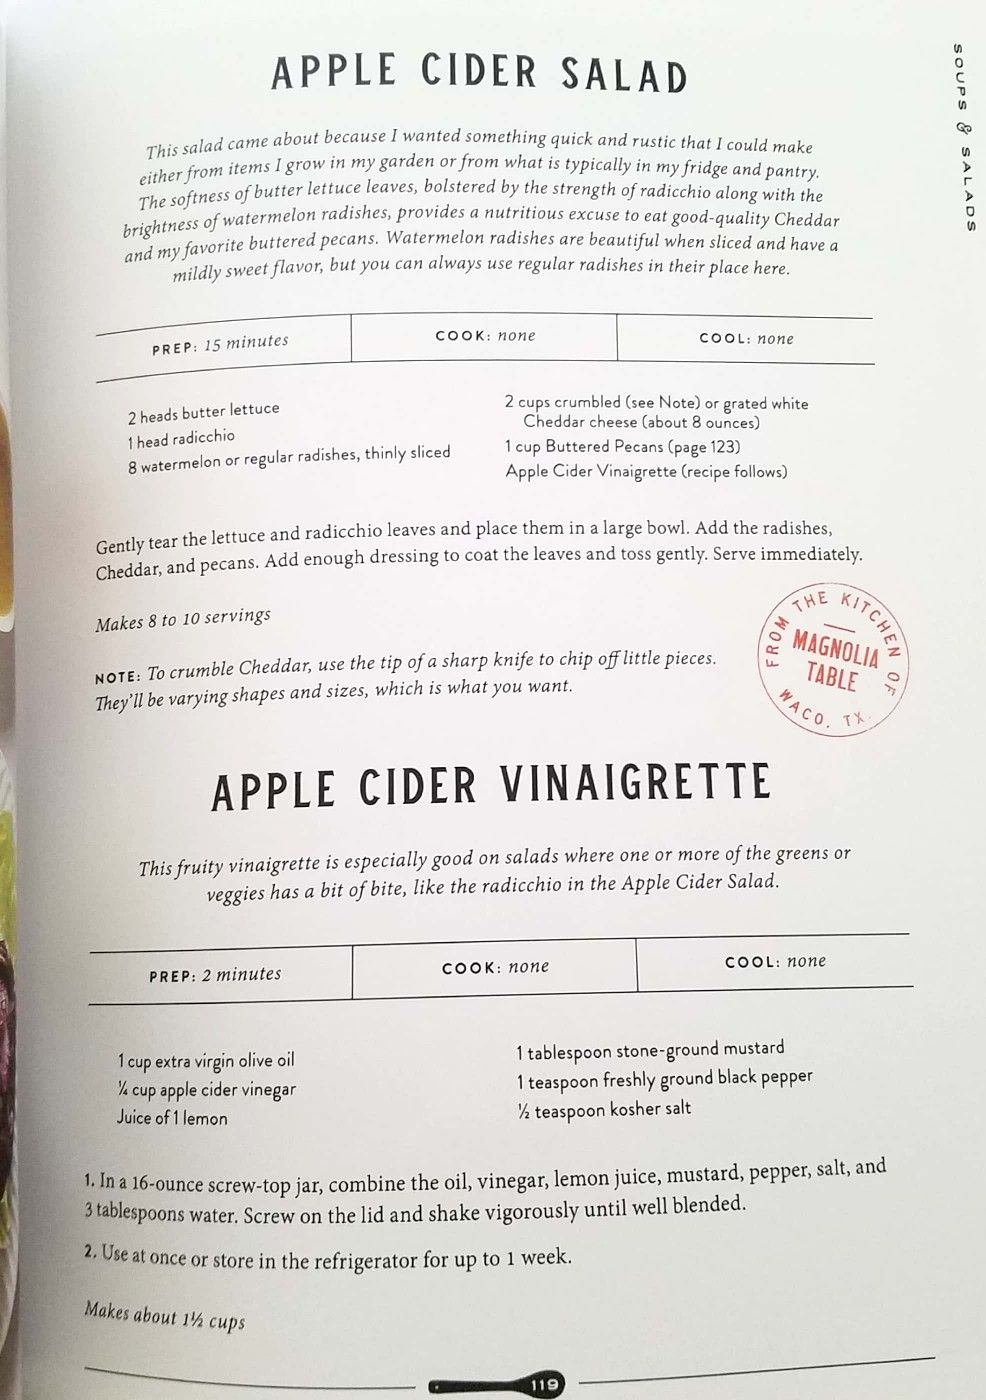 Joanna Gaines S Recipe Apple Cider Vinaigrette Homemade Salad Dressing Vintage Recipes Salad Dressing Recipes